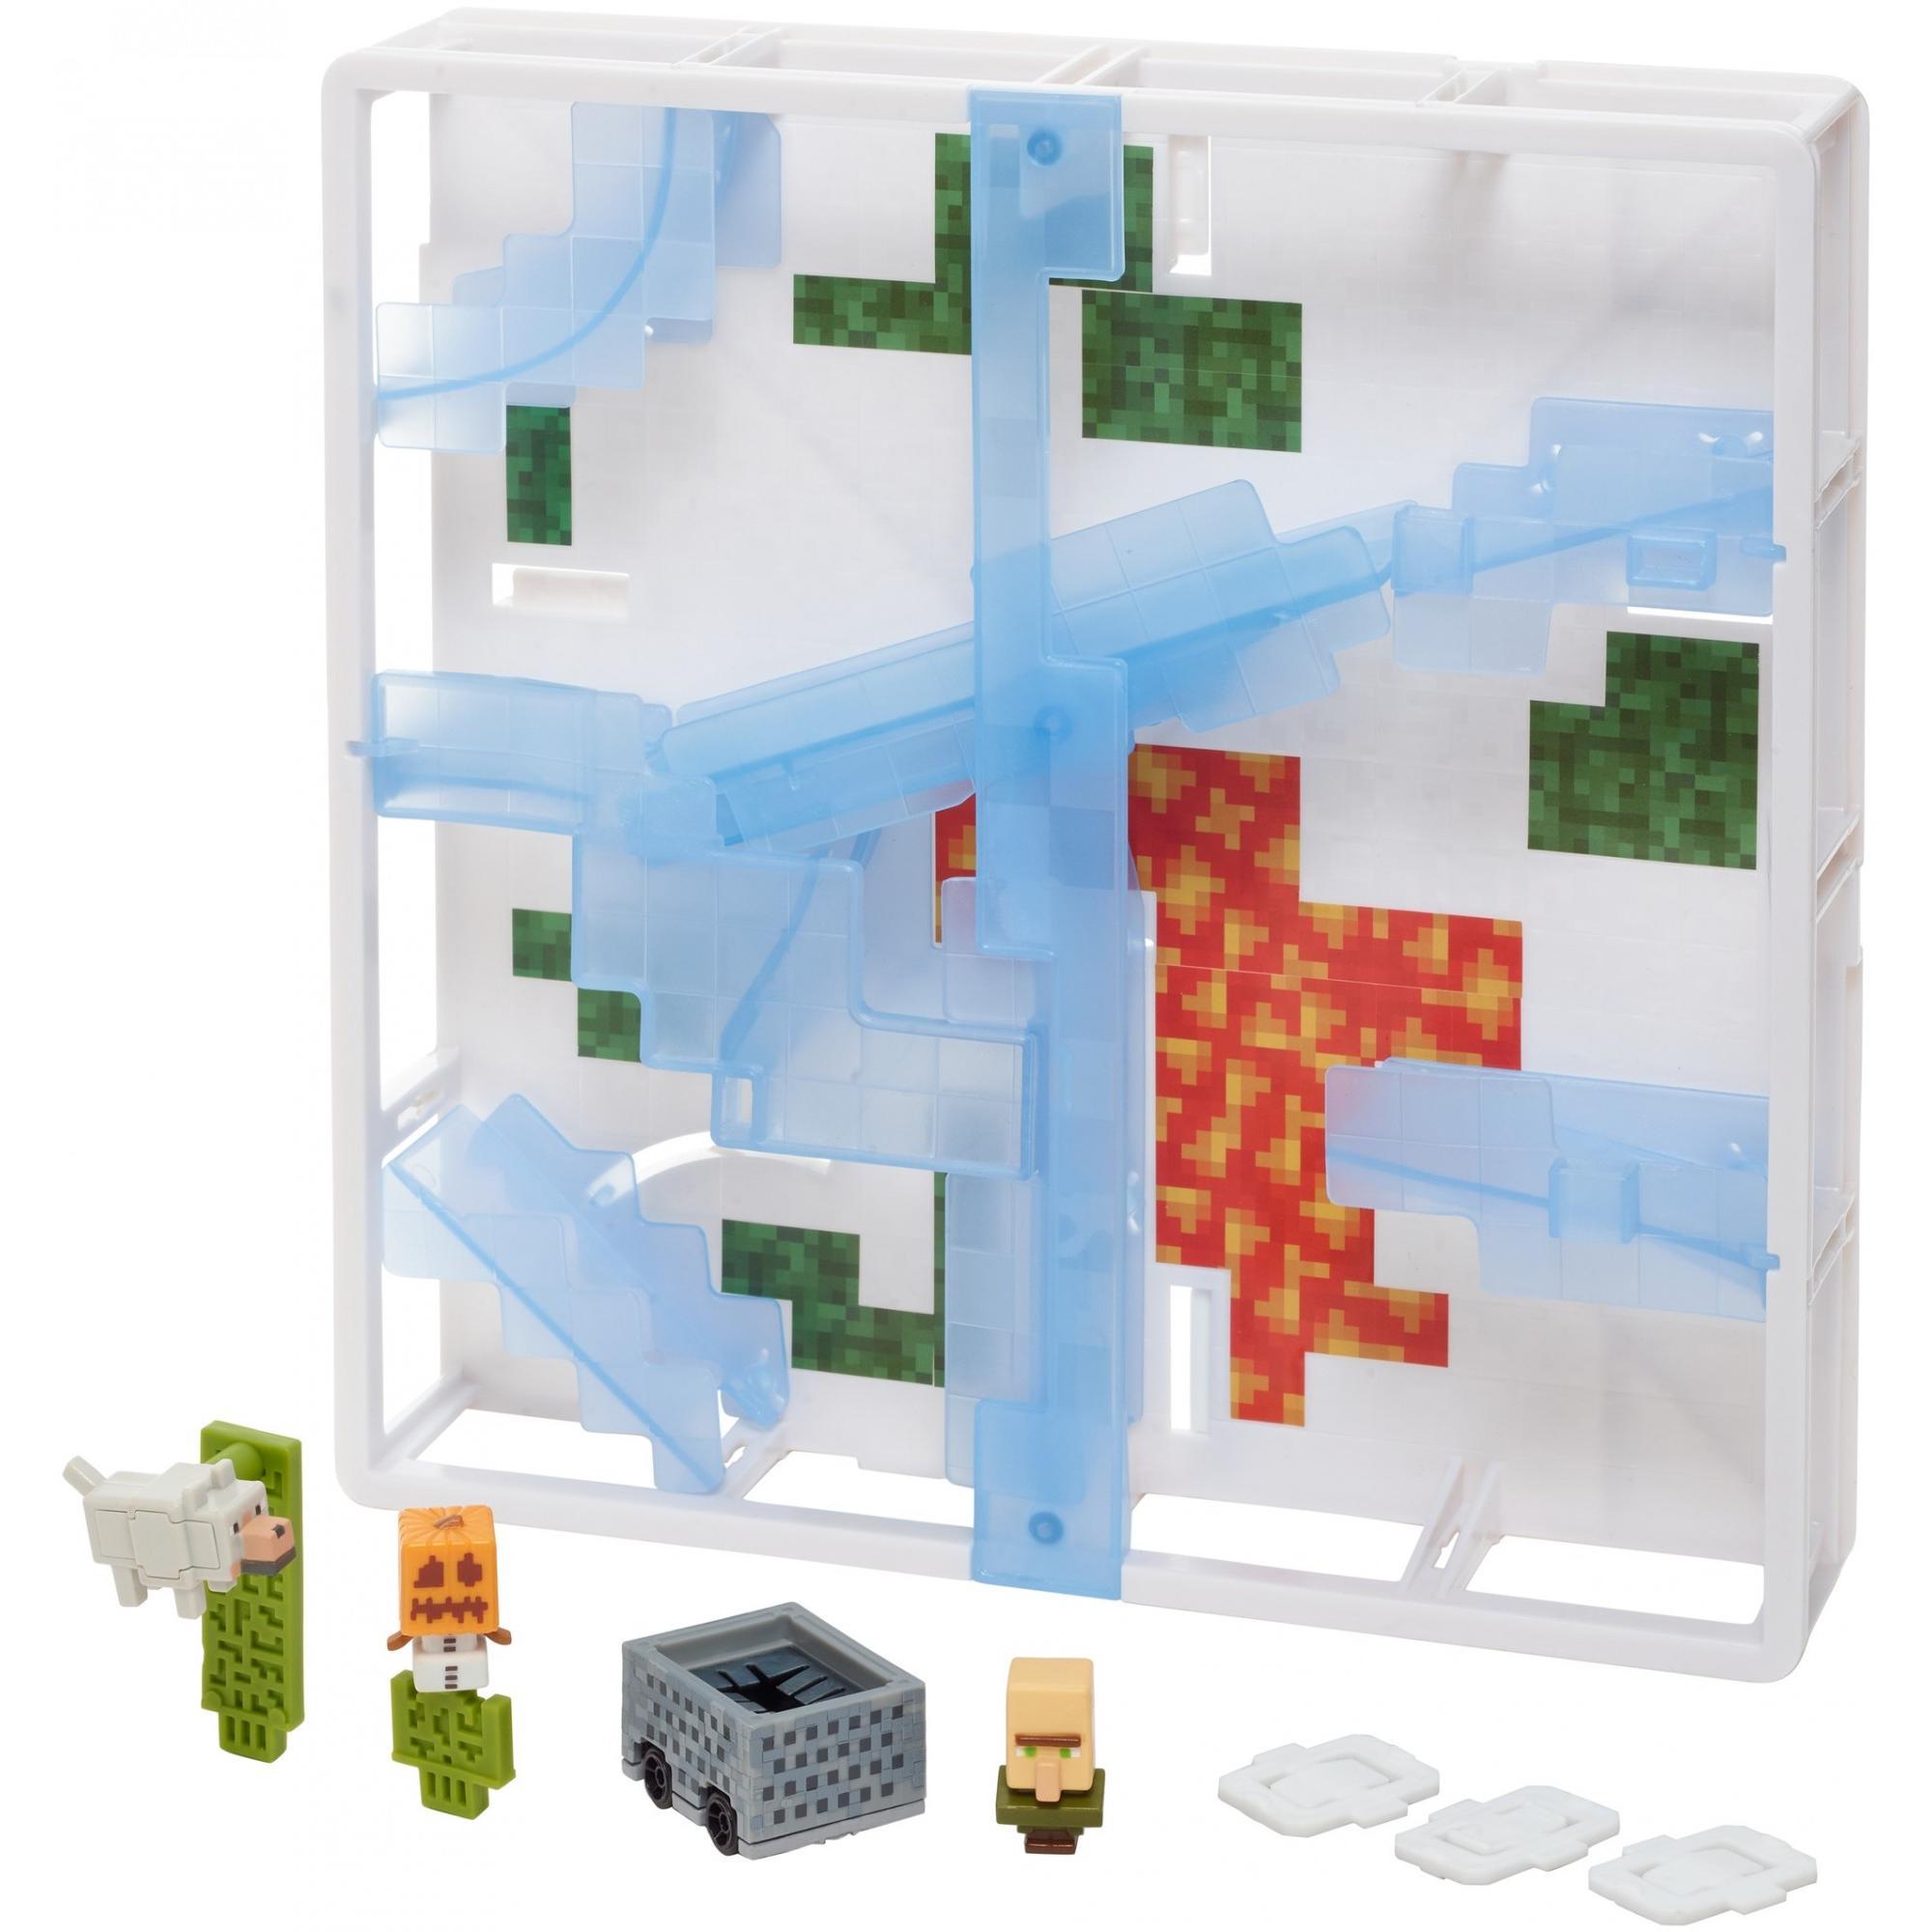 Hot Wheels Minecraft Track Blocks Glacier Slide by Mattel